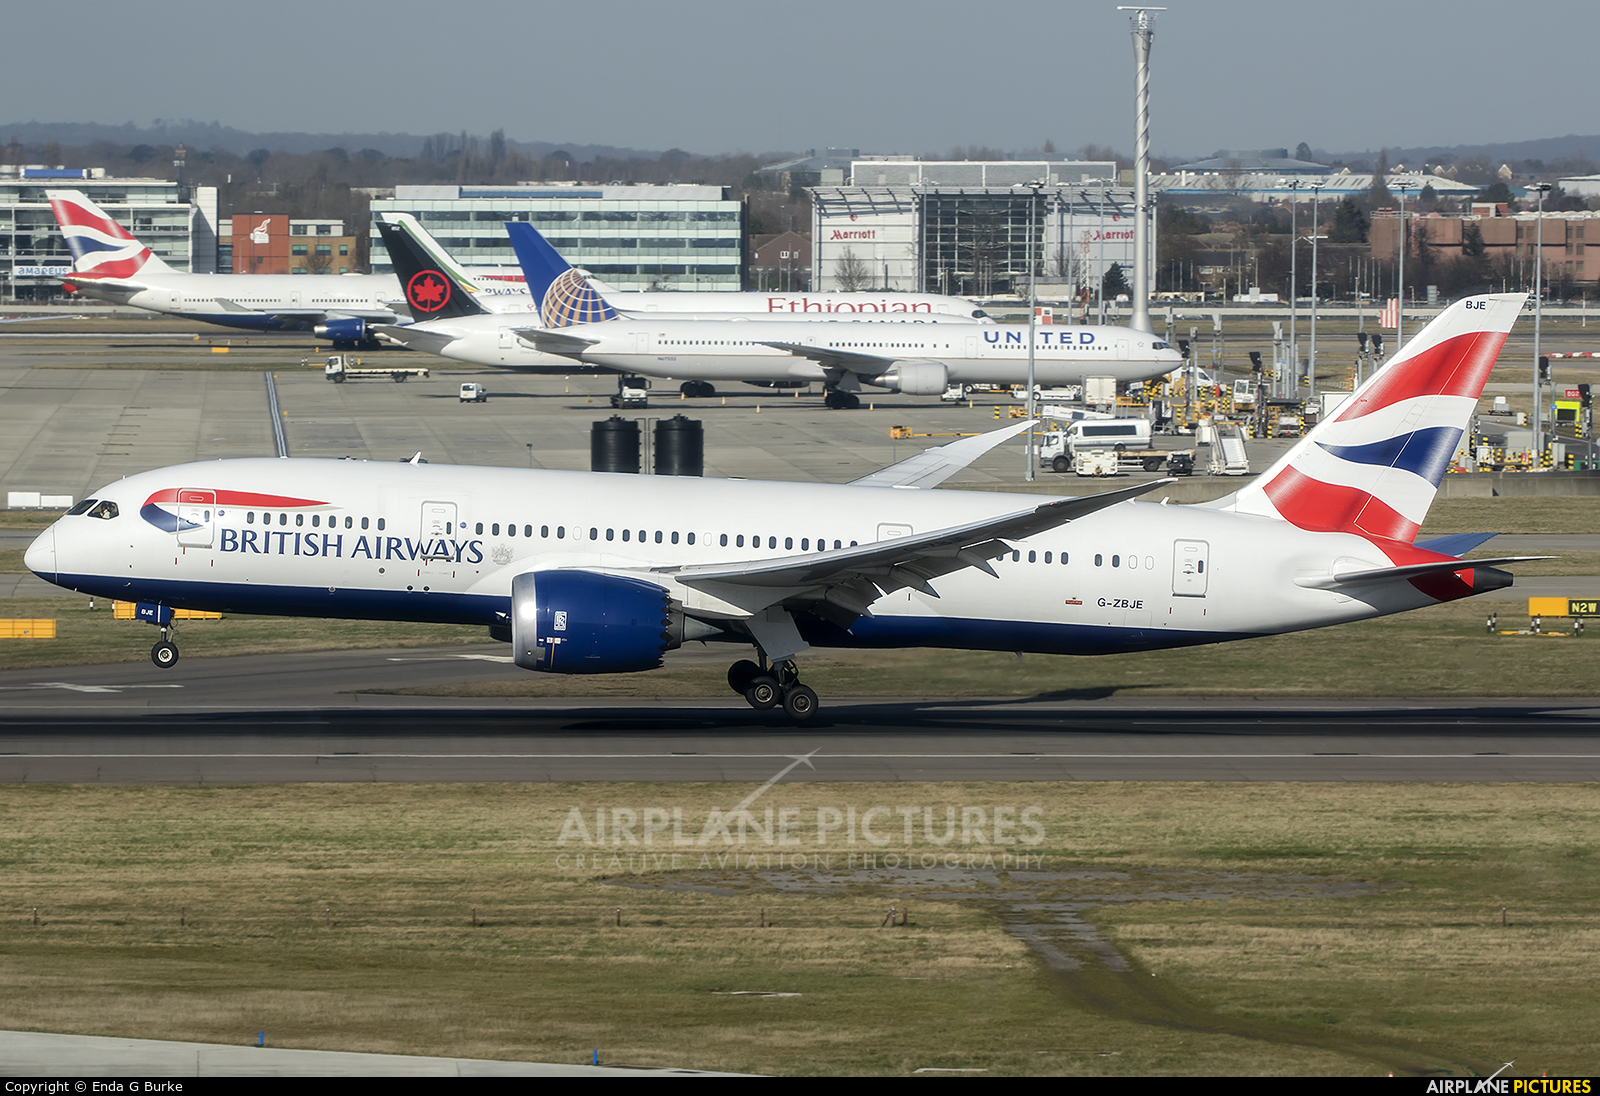 British Airways G-ZBJE aircraft at London - Heathrow